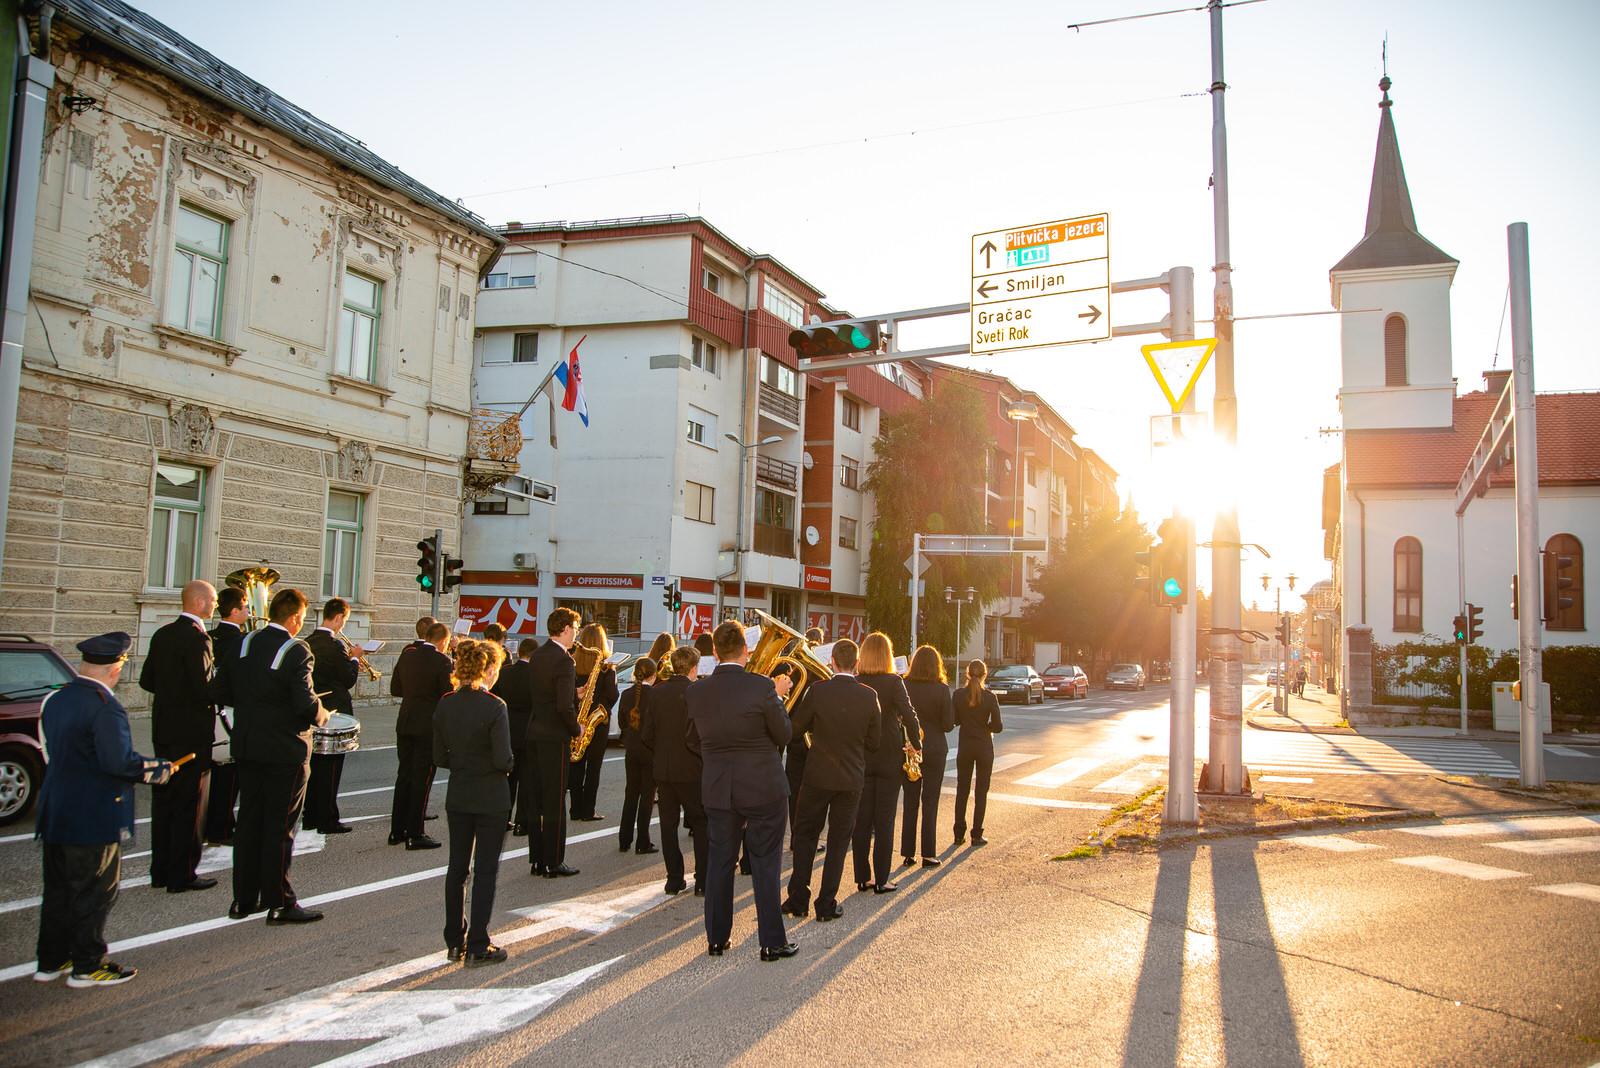 likaclub_budnica puhačkog orkestra povodom dana grada_22_7_2020 (69)